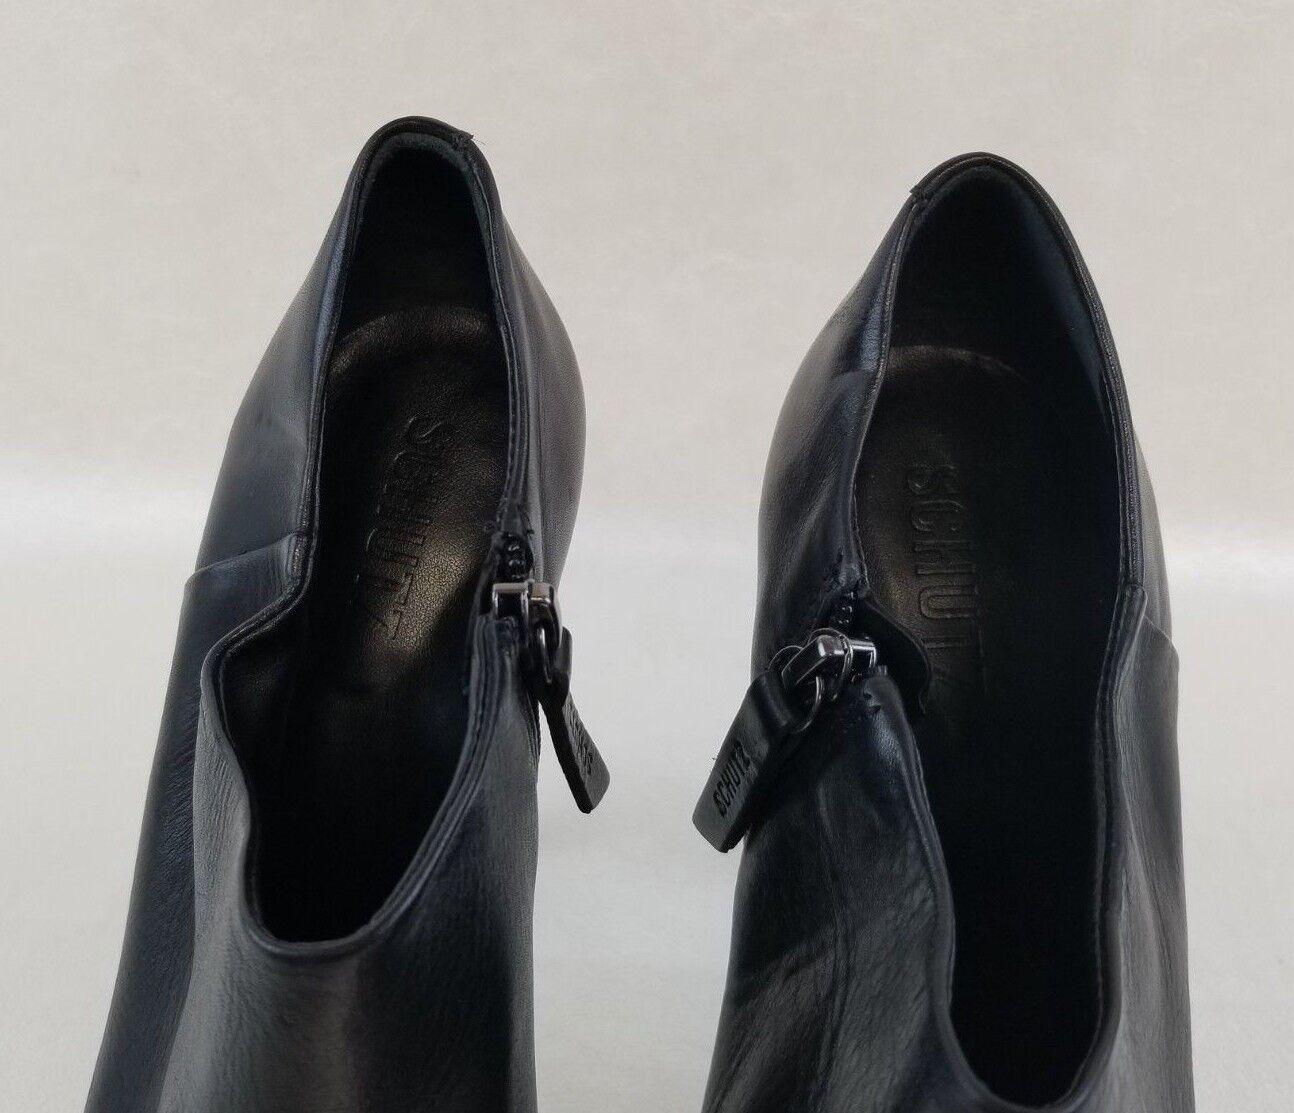 Schutz Platform Stiletto Booties Donna Zip Nero Nero Nero Pelle Shoes Sz EU 40   9.5 58aba8